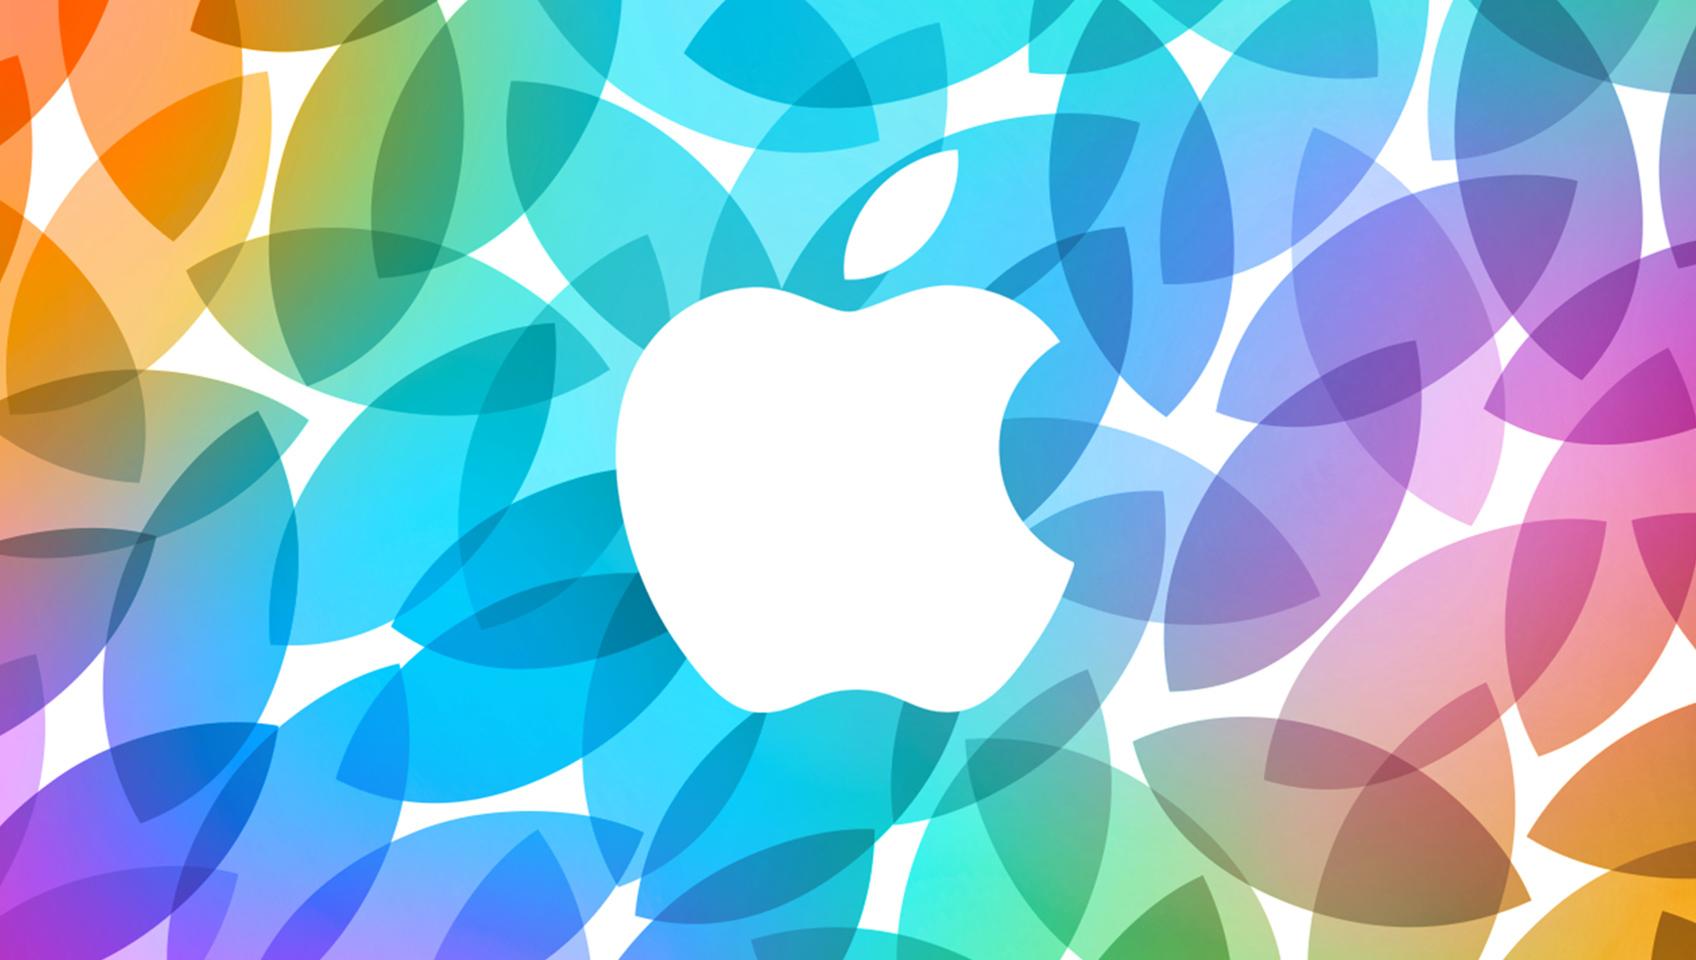 Apple возглавил список самых инновационных компаний за 2014 год